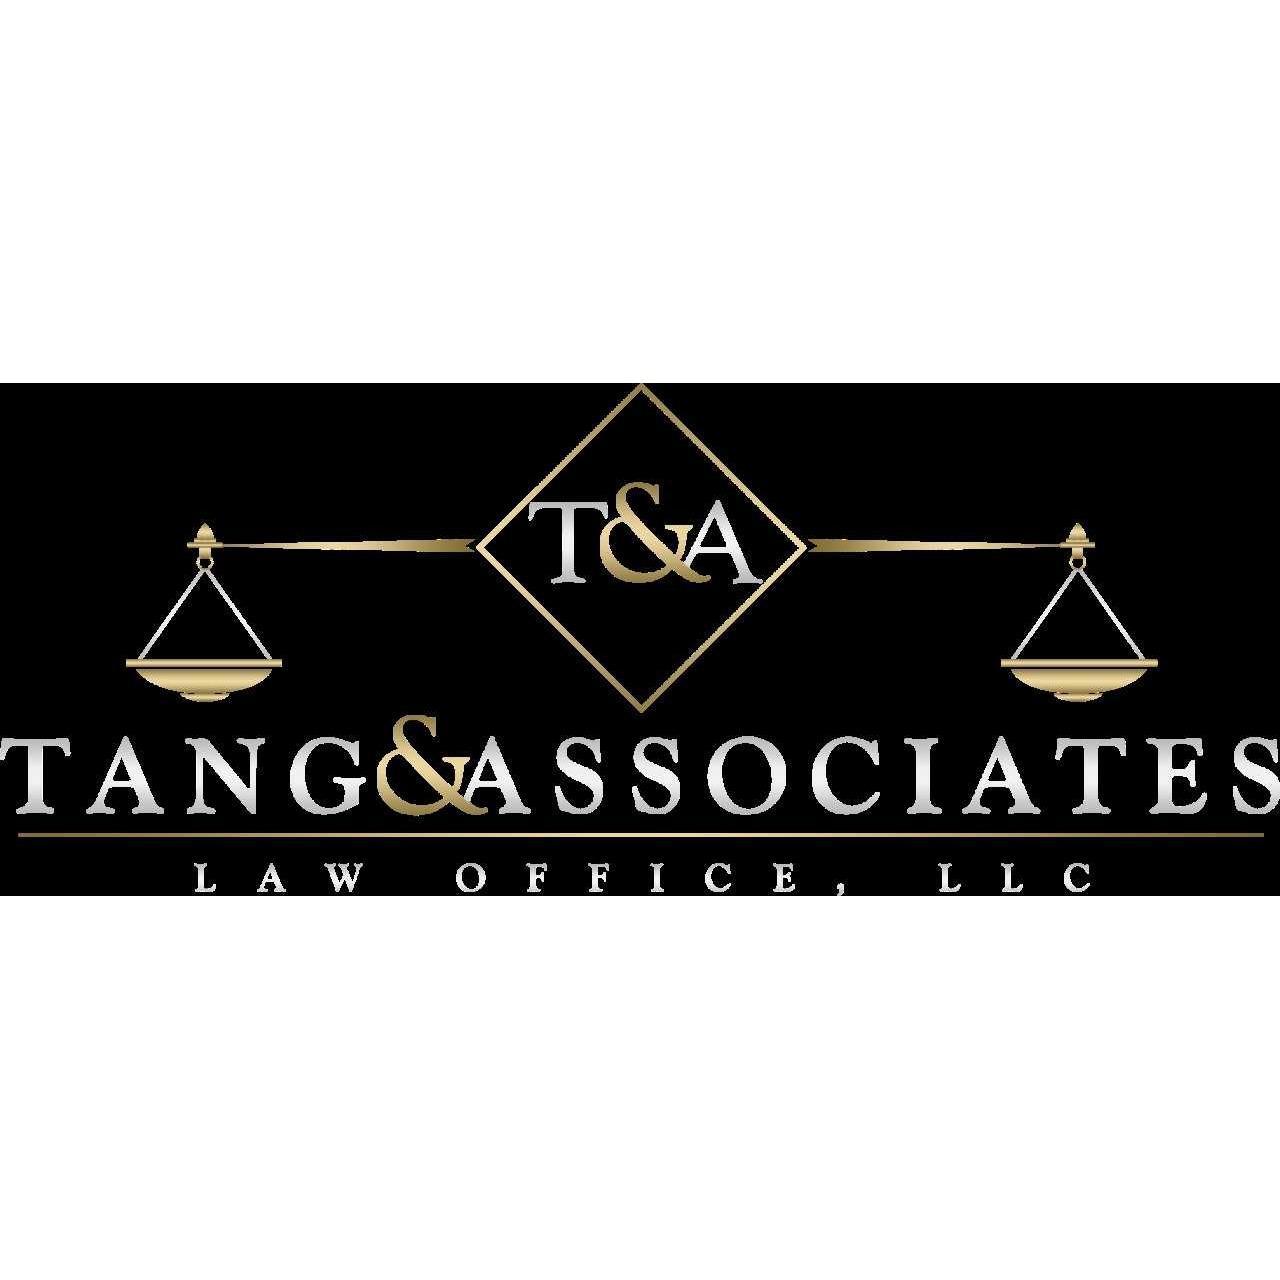 Tang & Associates Law Office, LLC